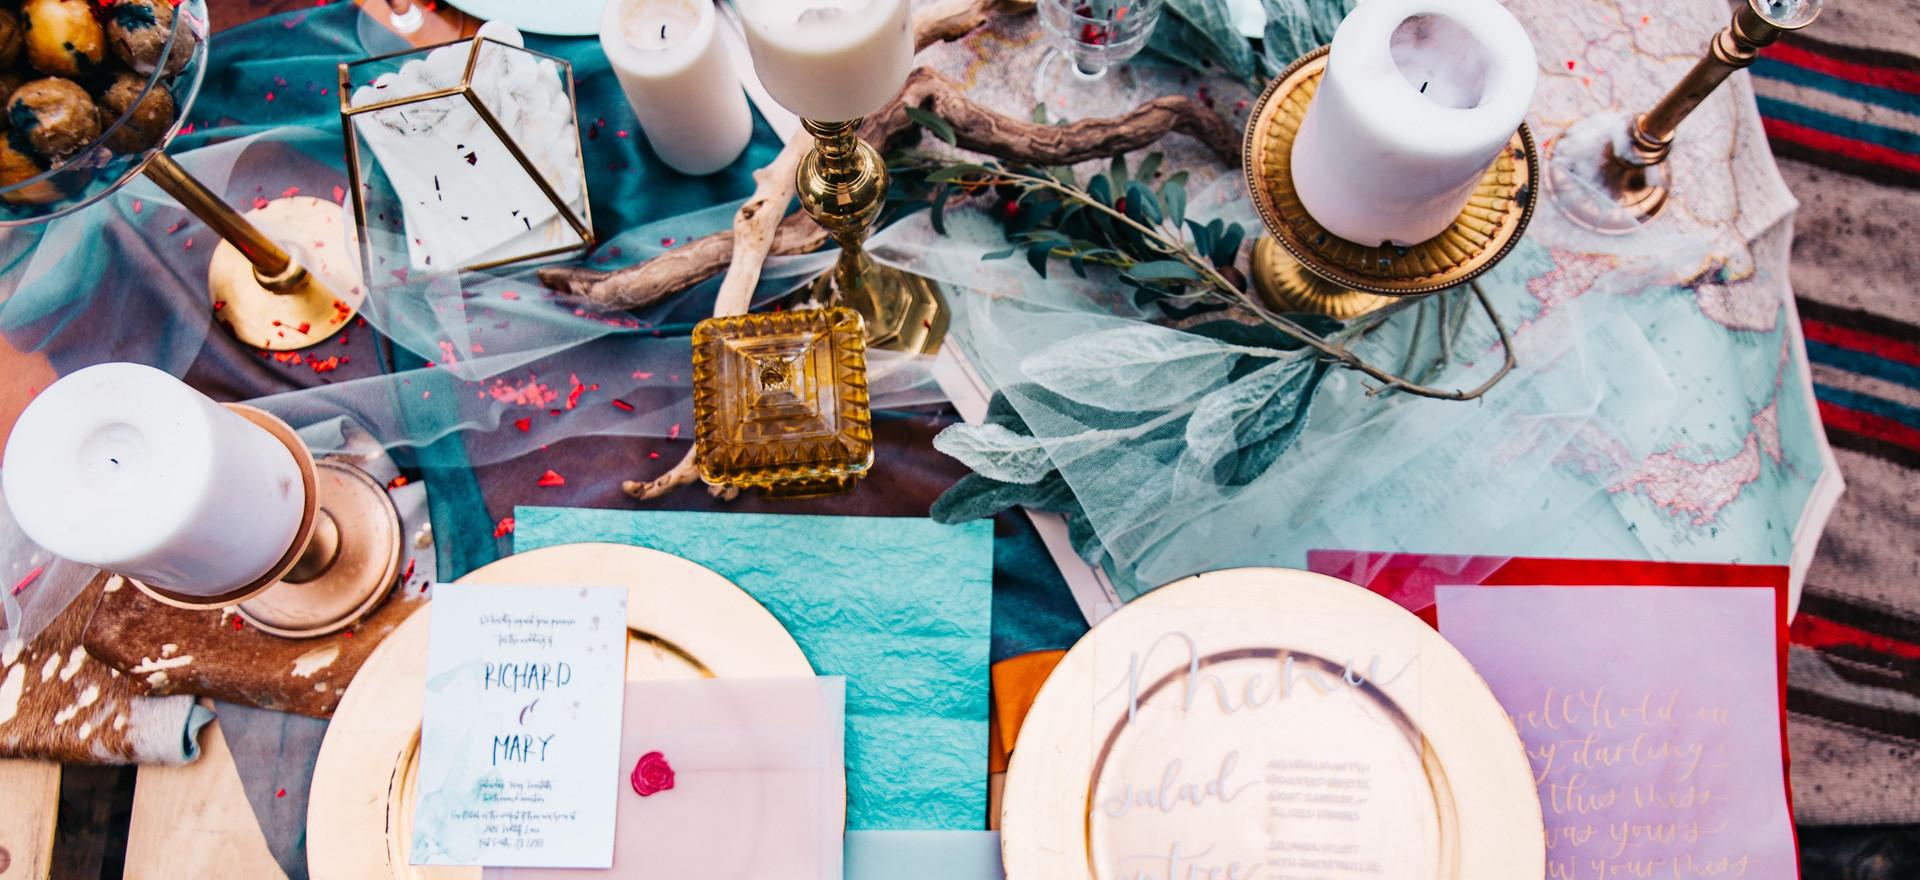 Elemental Ceremony Table